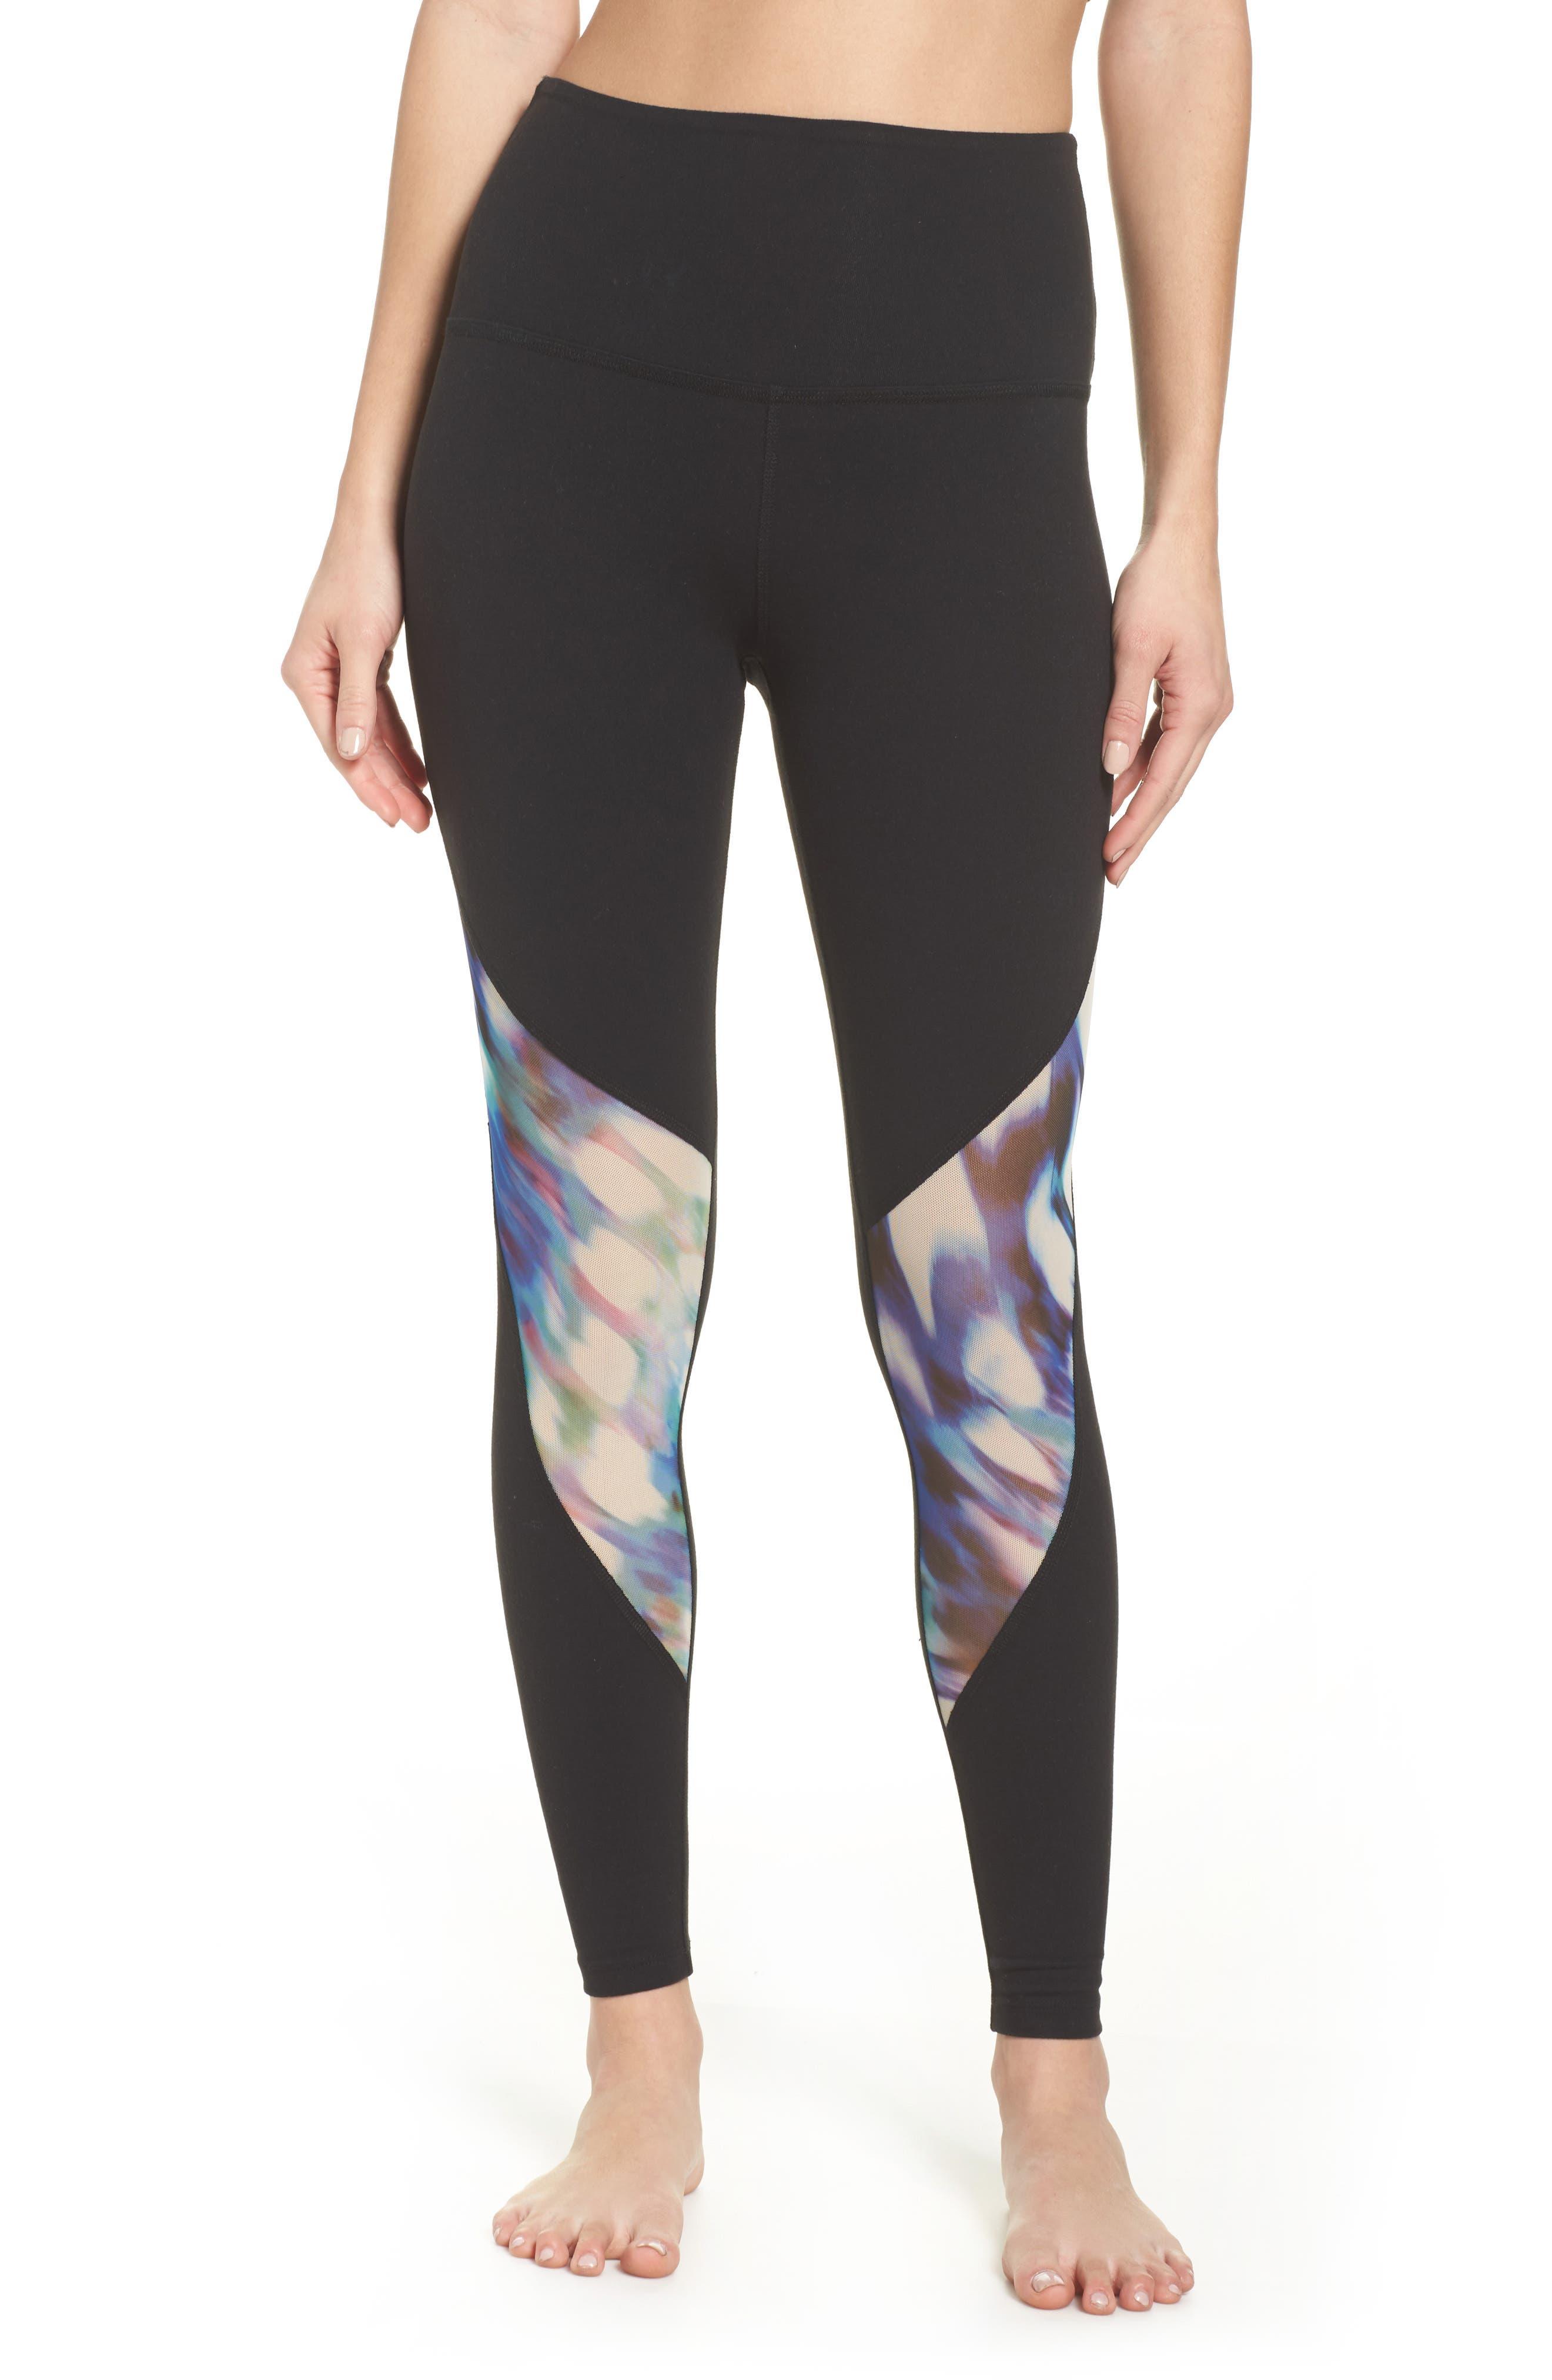 Prismatic High Waist Leggings,                         Main,                         color, 002